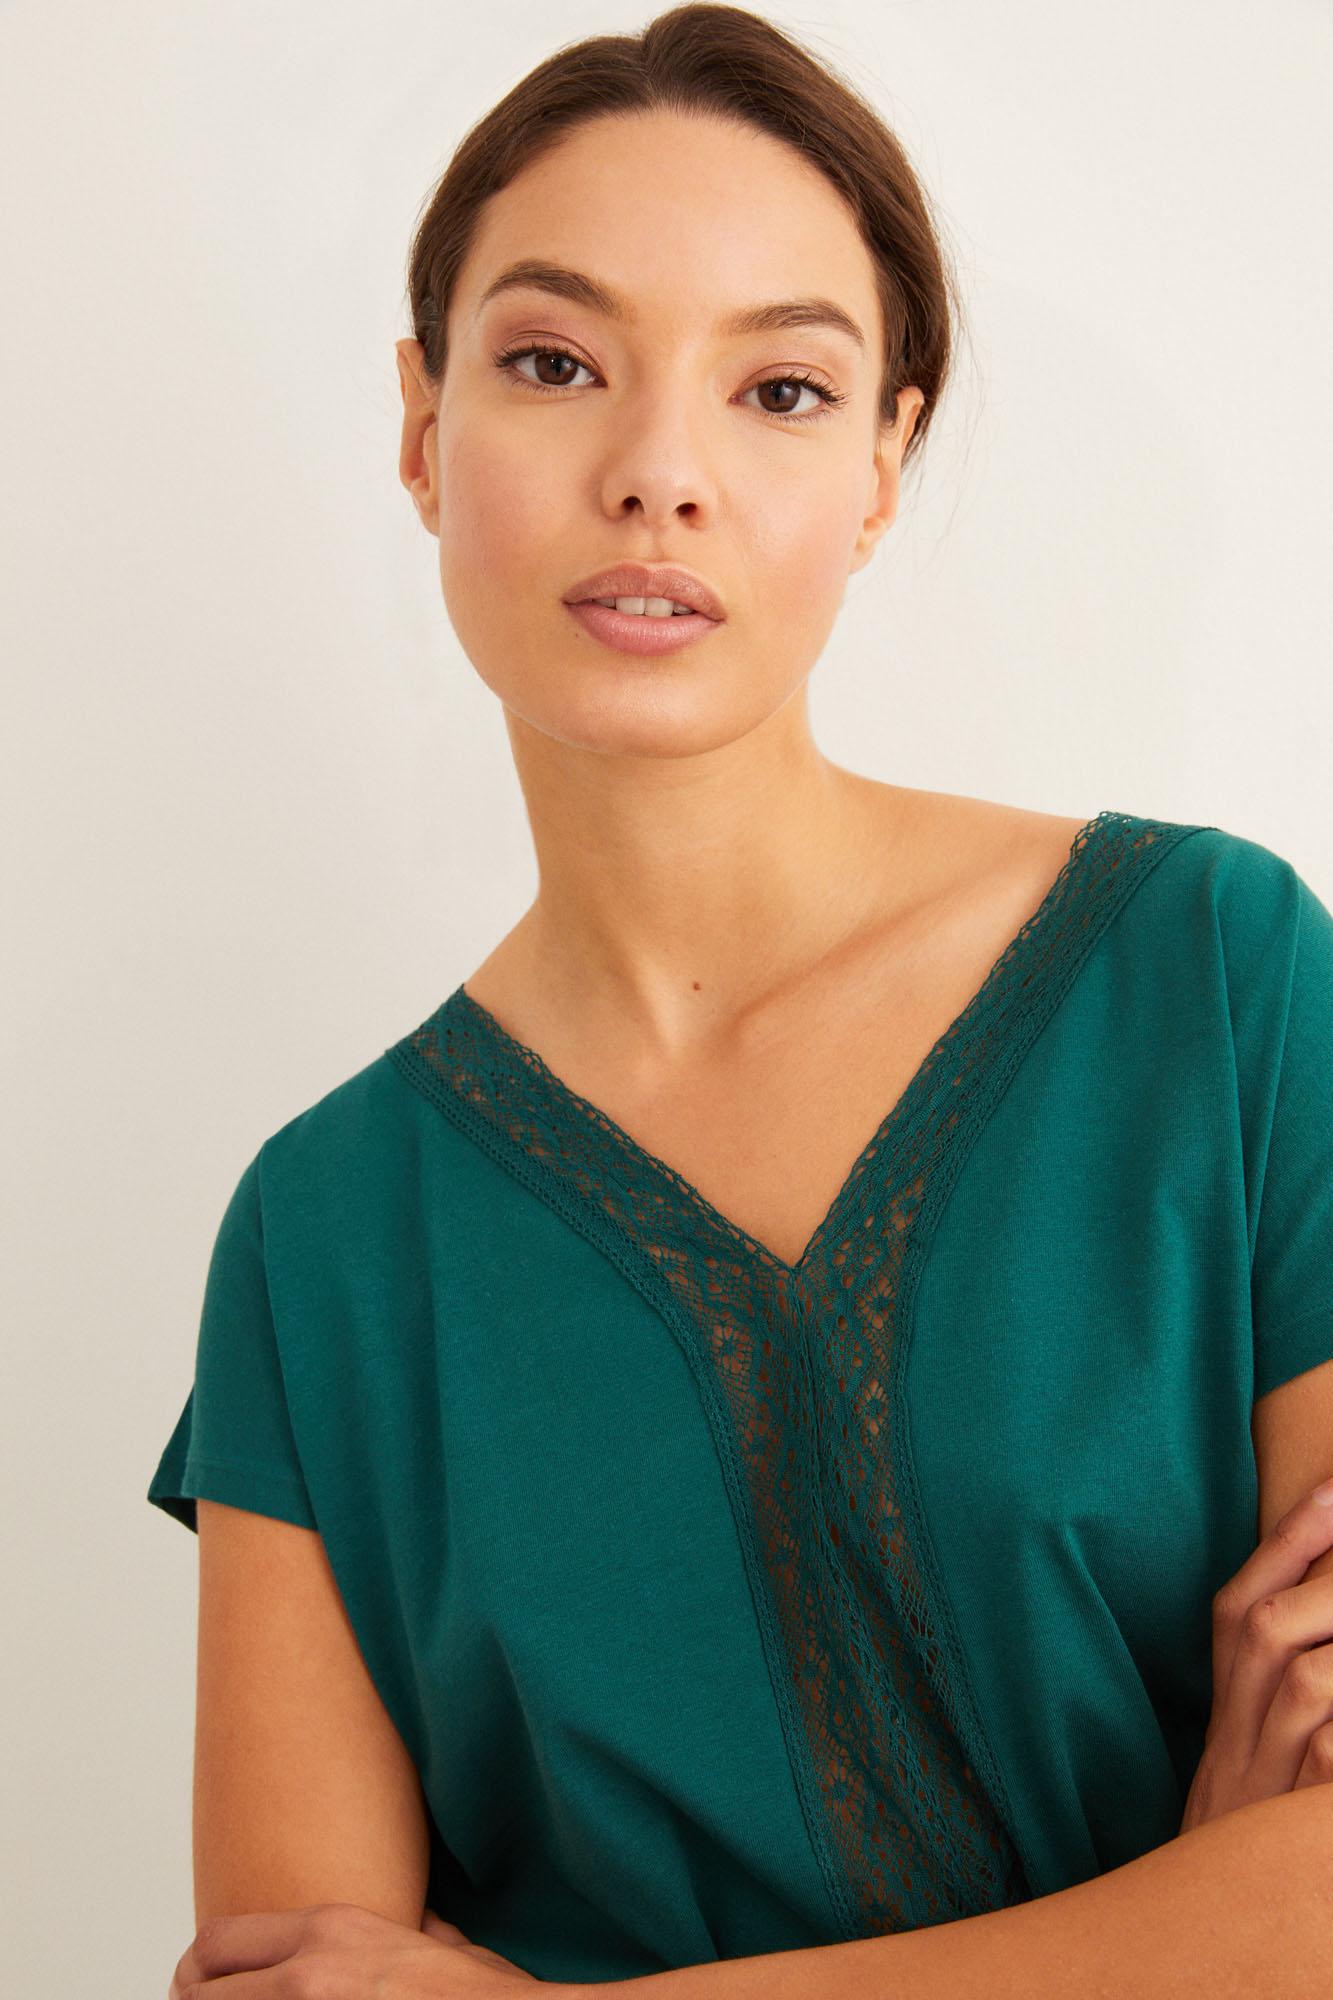 Camiseta detalle encaje | Camisetas | Women'secret